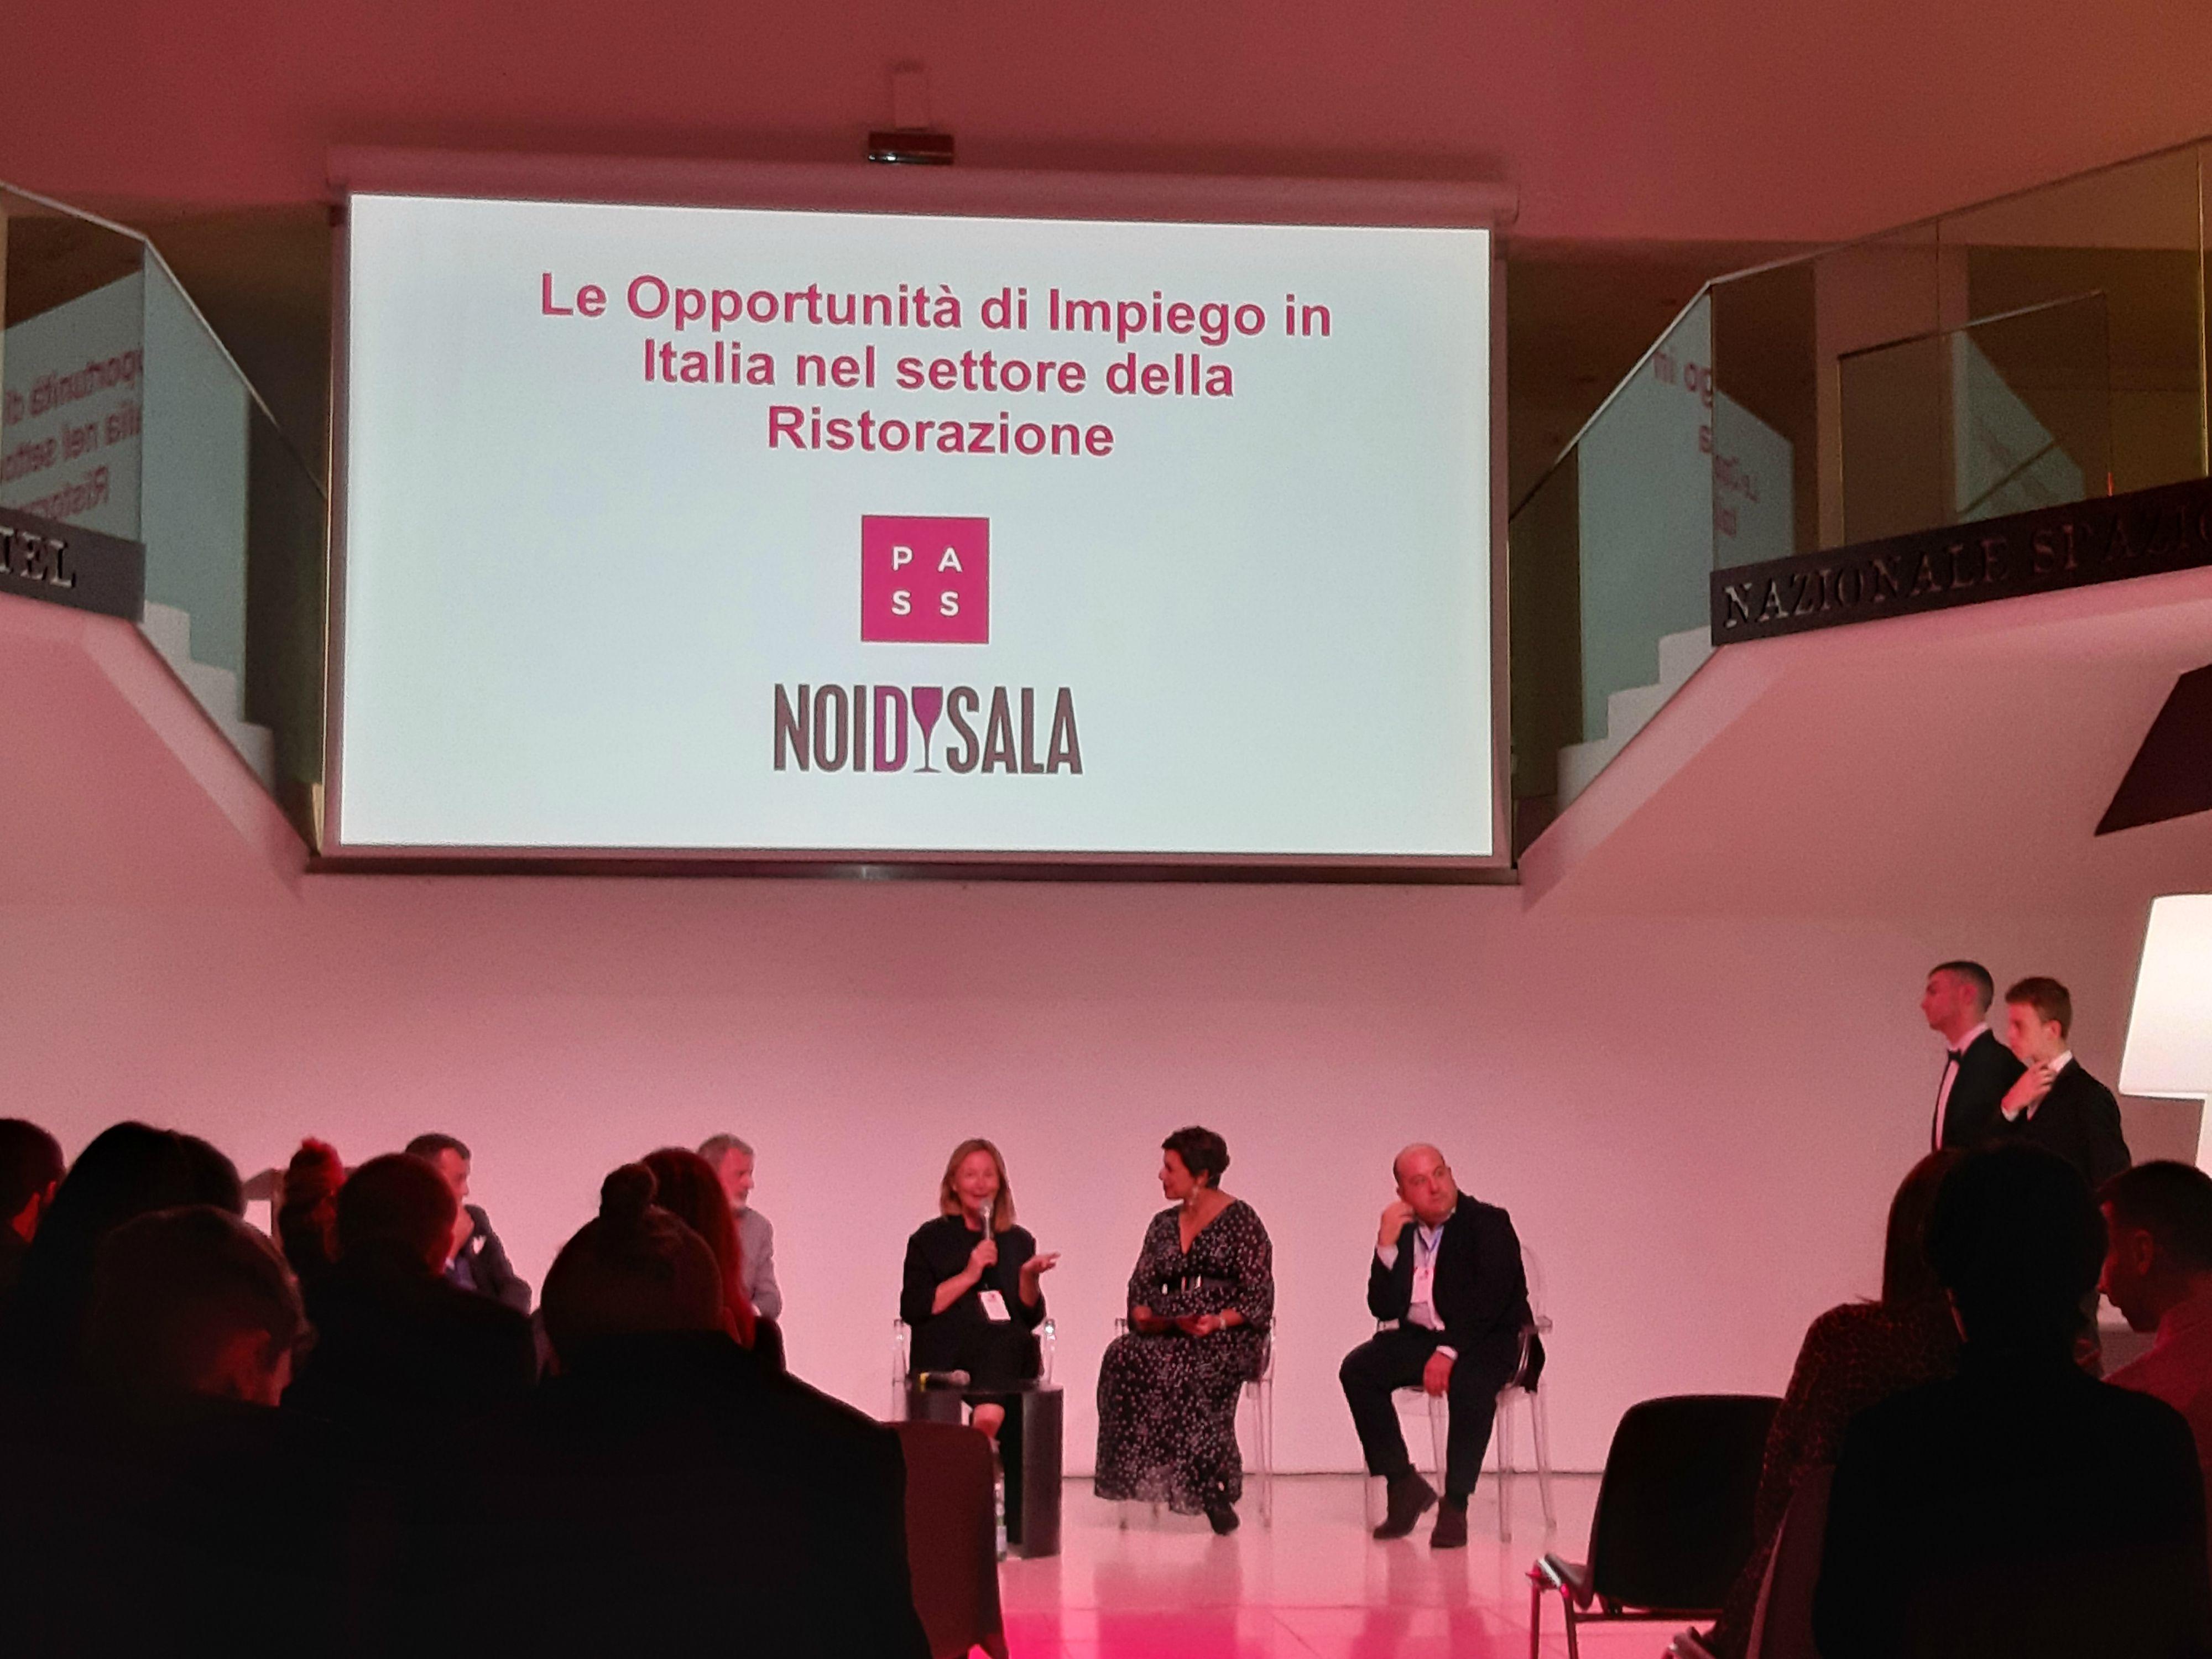 NOI DI SALA talk